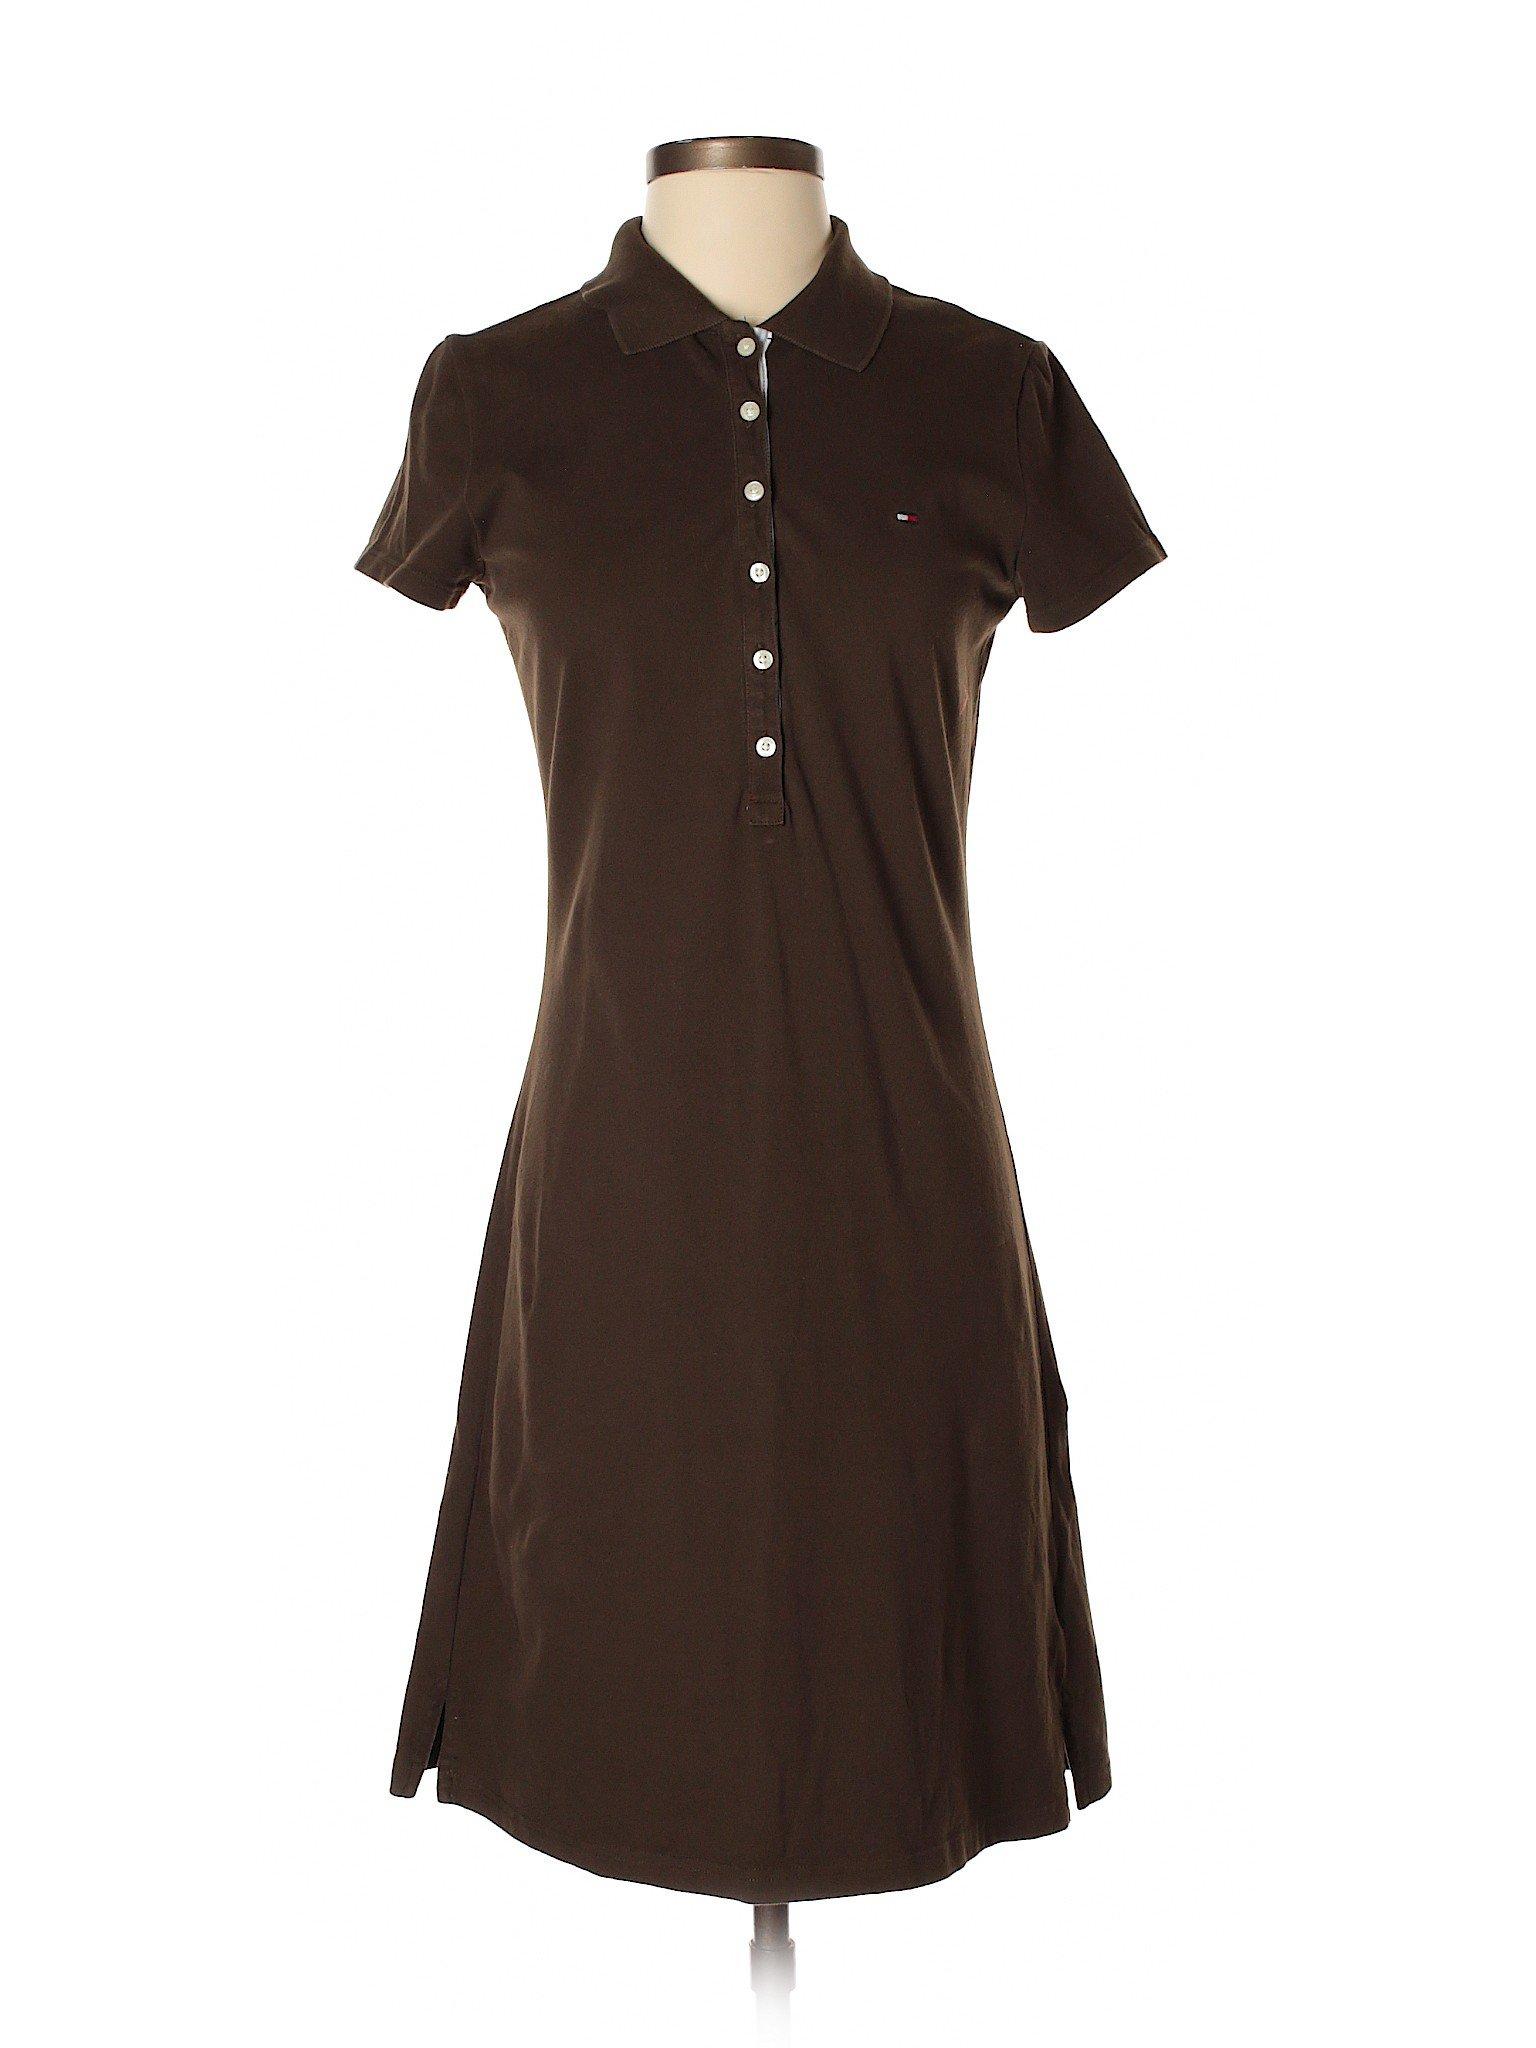 Boutique Casual Tommy Hilfiger winter Dress vRwRxBq